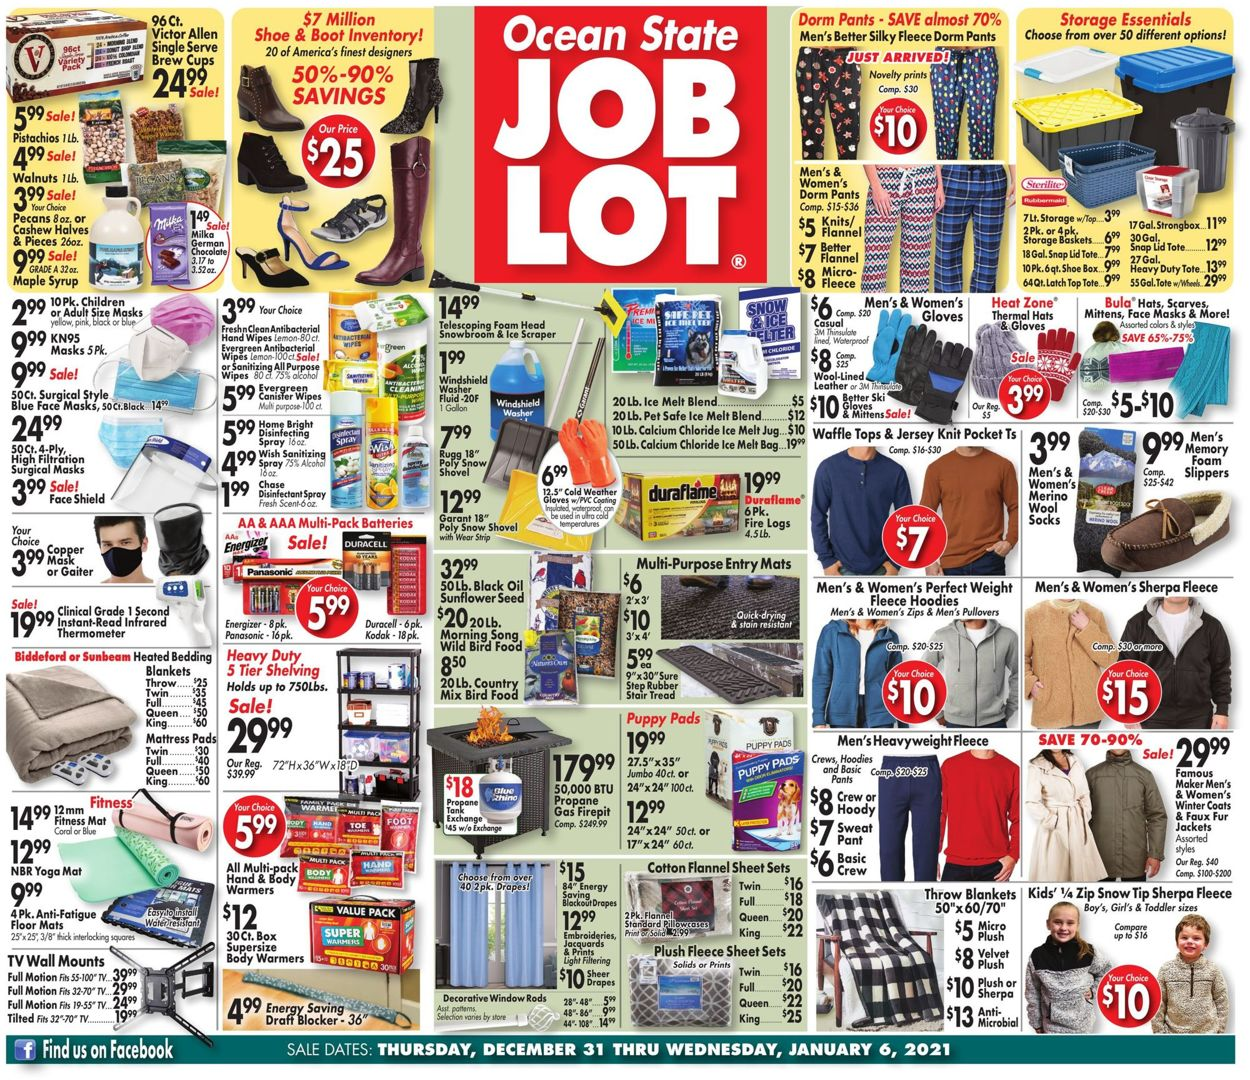 Ocean State Job Lot Weekly Ad Circular - valid 12/31-01/06/2021